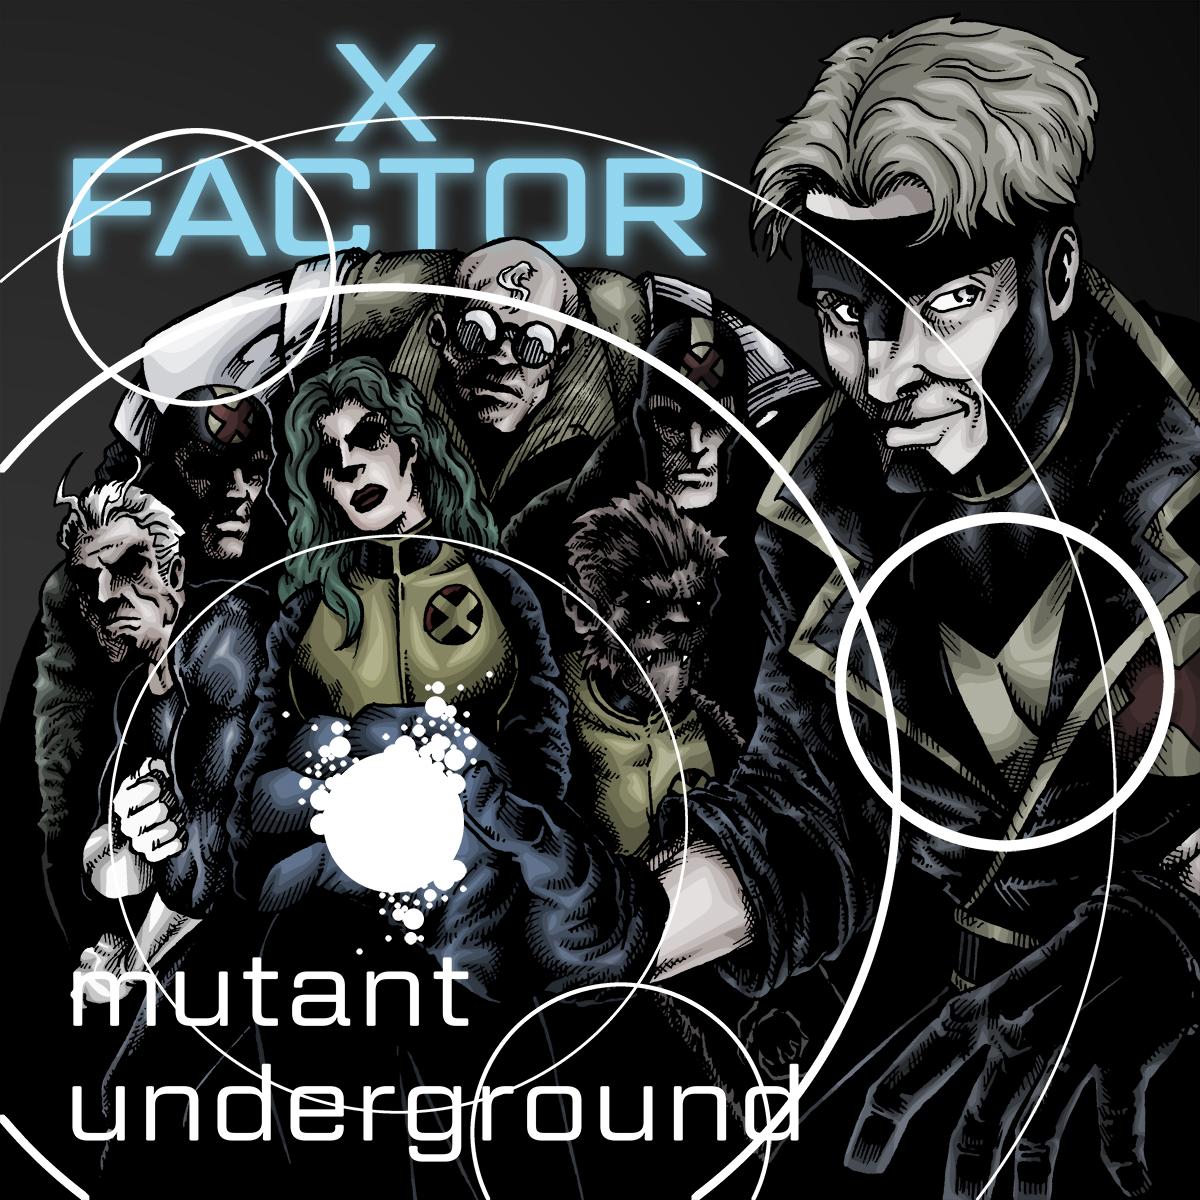 277. X-Factor